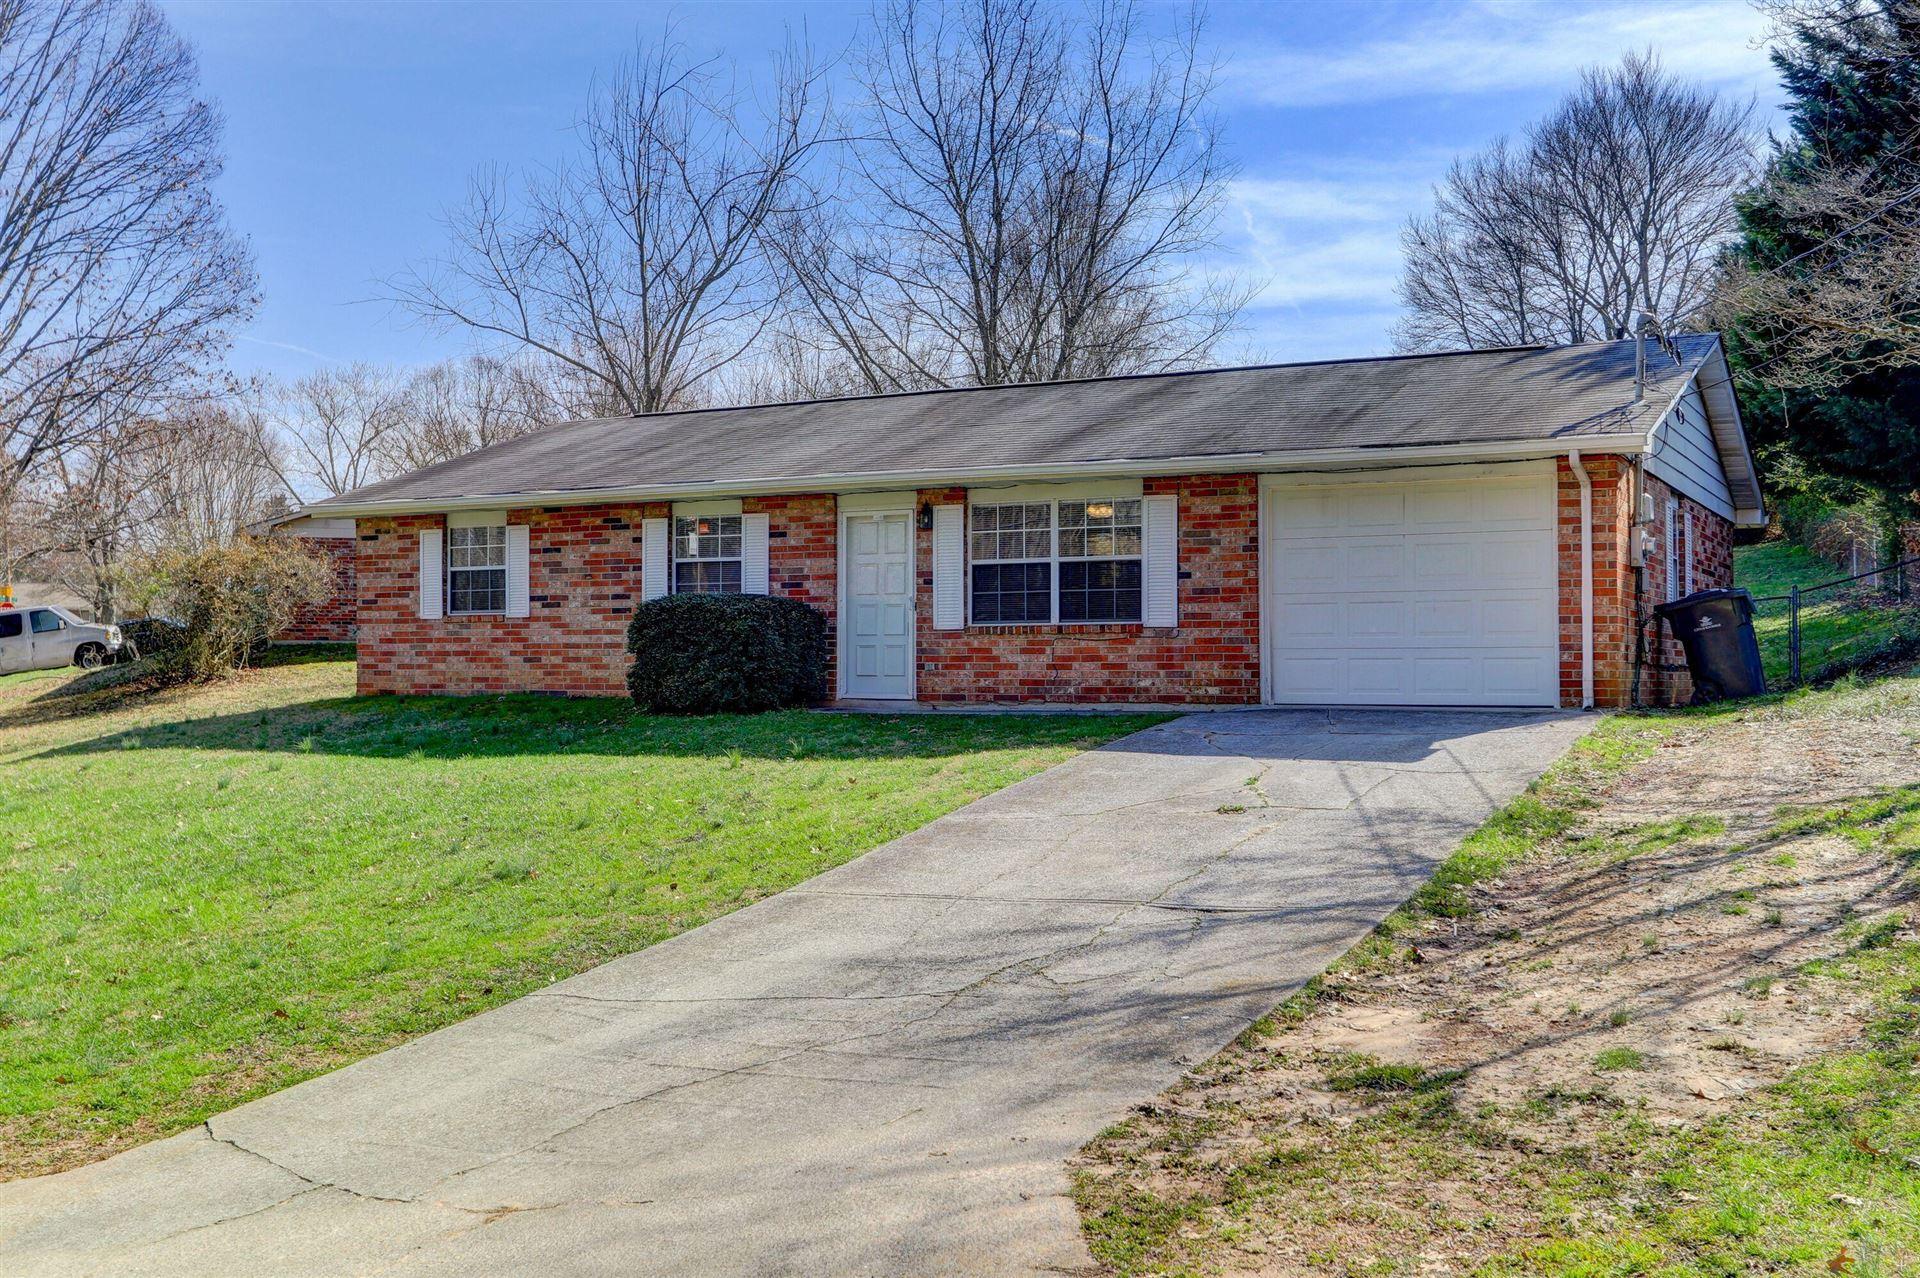 Photo of 5608 Ridgetop Rd, Knoxville, TN 37921 (MLS # 1108379)